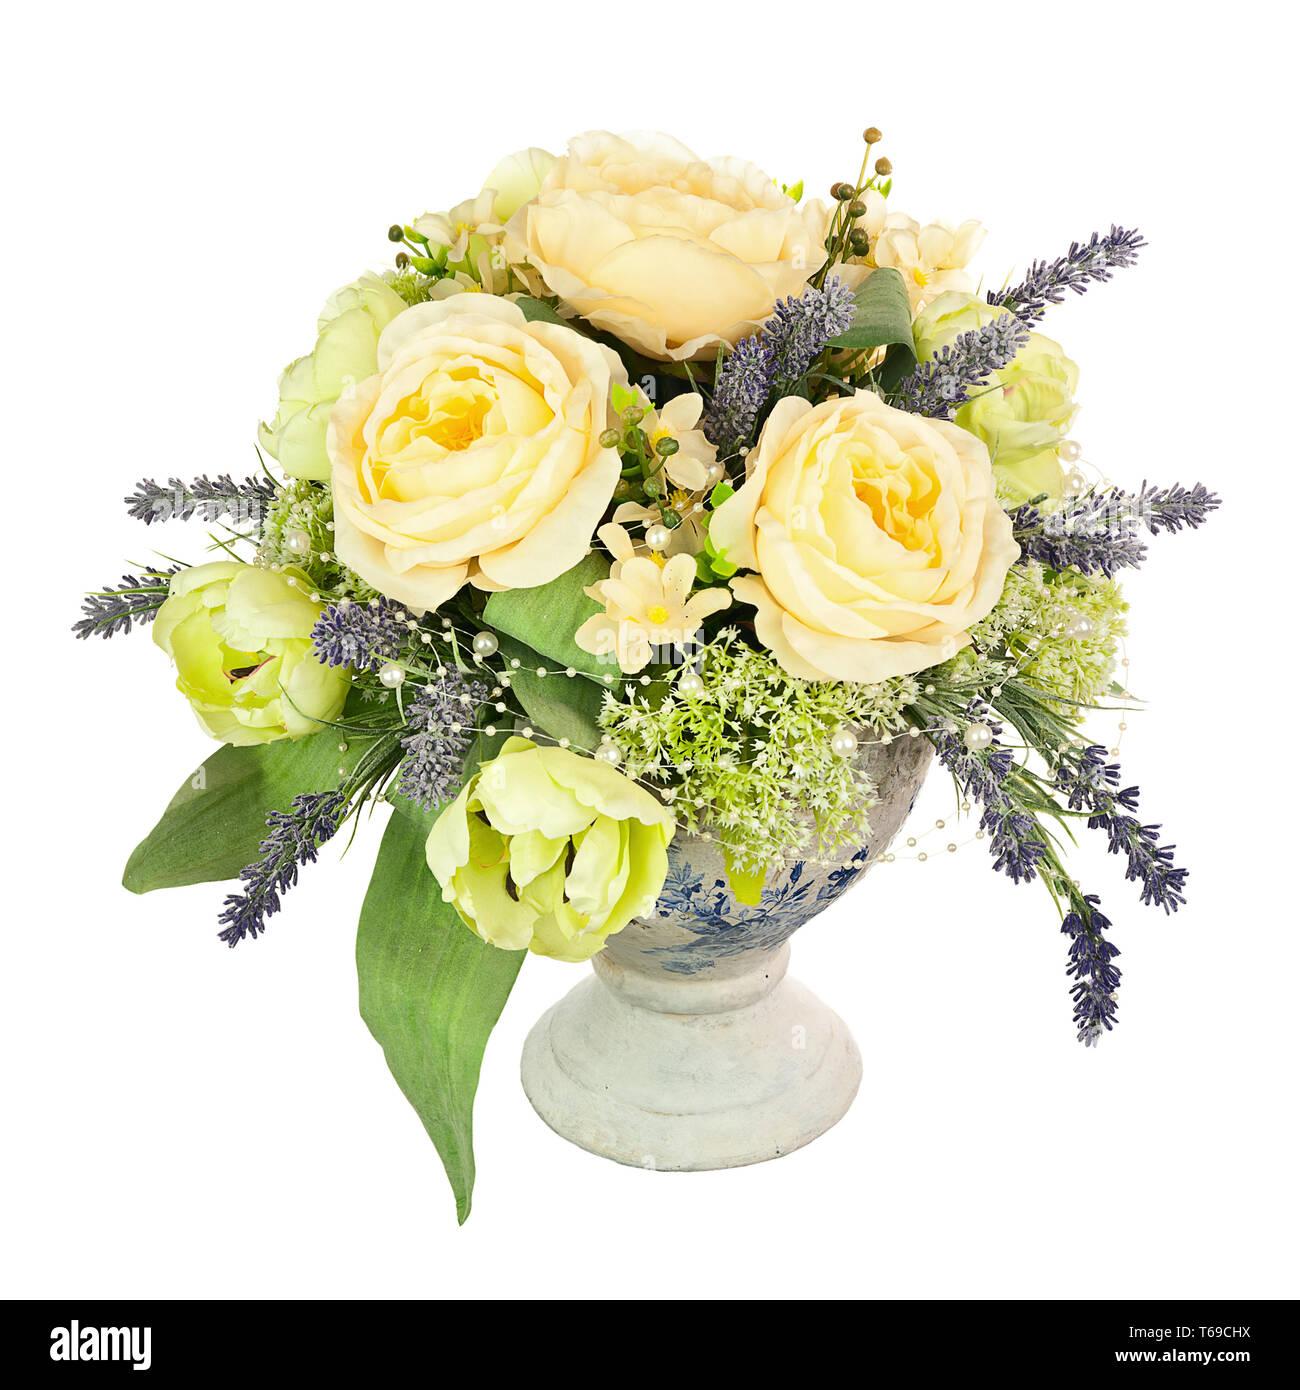 Bouquet from artificial flowers arrangement centerpiece in old vase. Stock Photo